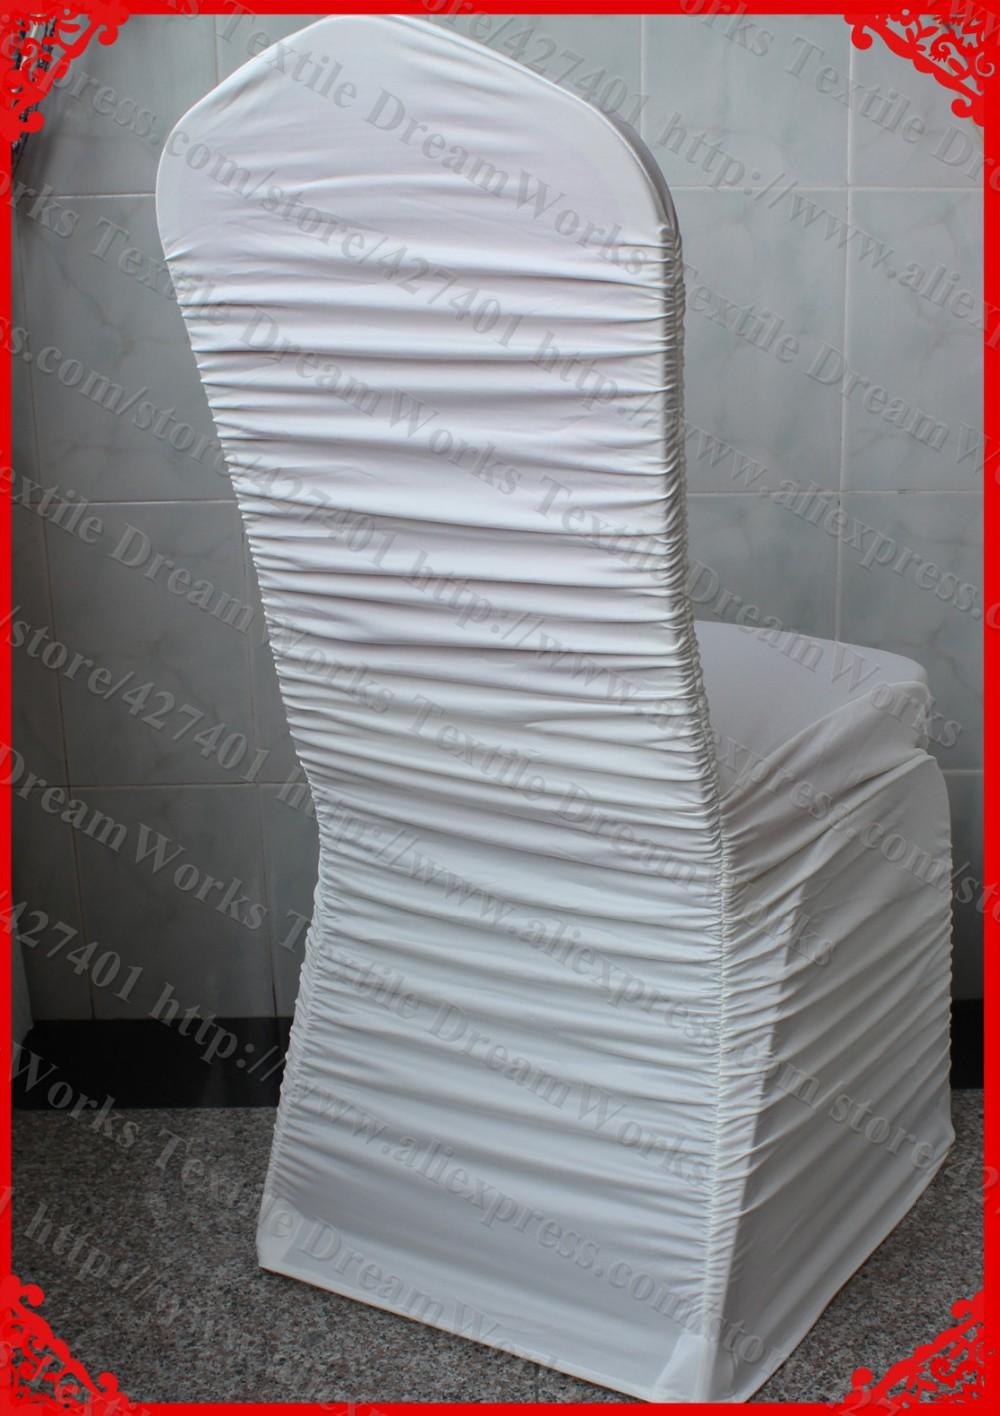 Akrilik Katun Kotak Make Up Bantalan Dudukan Case Organizer Kosmetik Remote Control Sheif Tempat Penyimpanan Remot Sj0048 Lycra Perjamuan Kursi Penutup Kami Bisa Muat Sebagian Besar